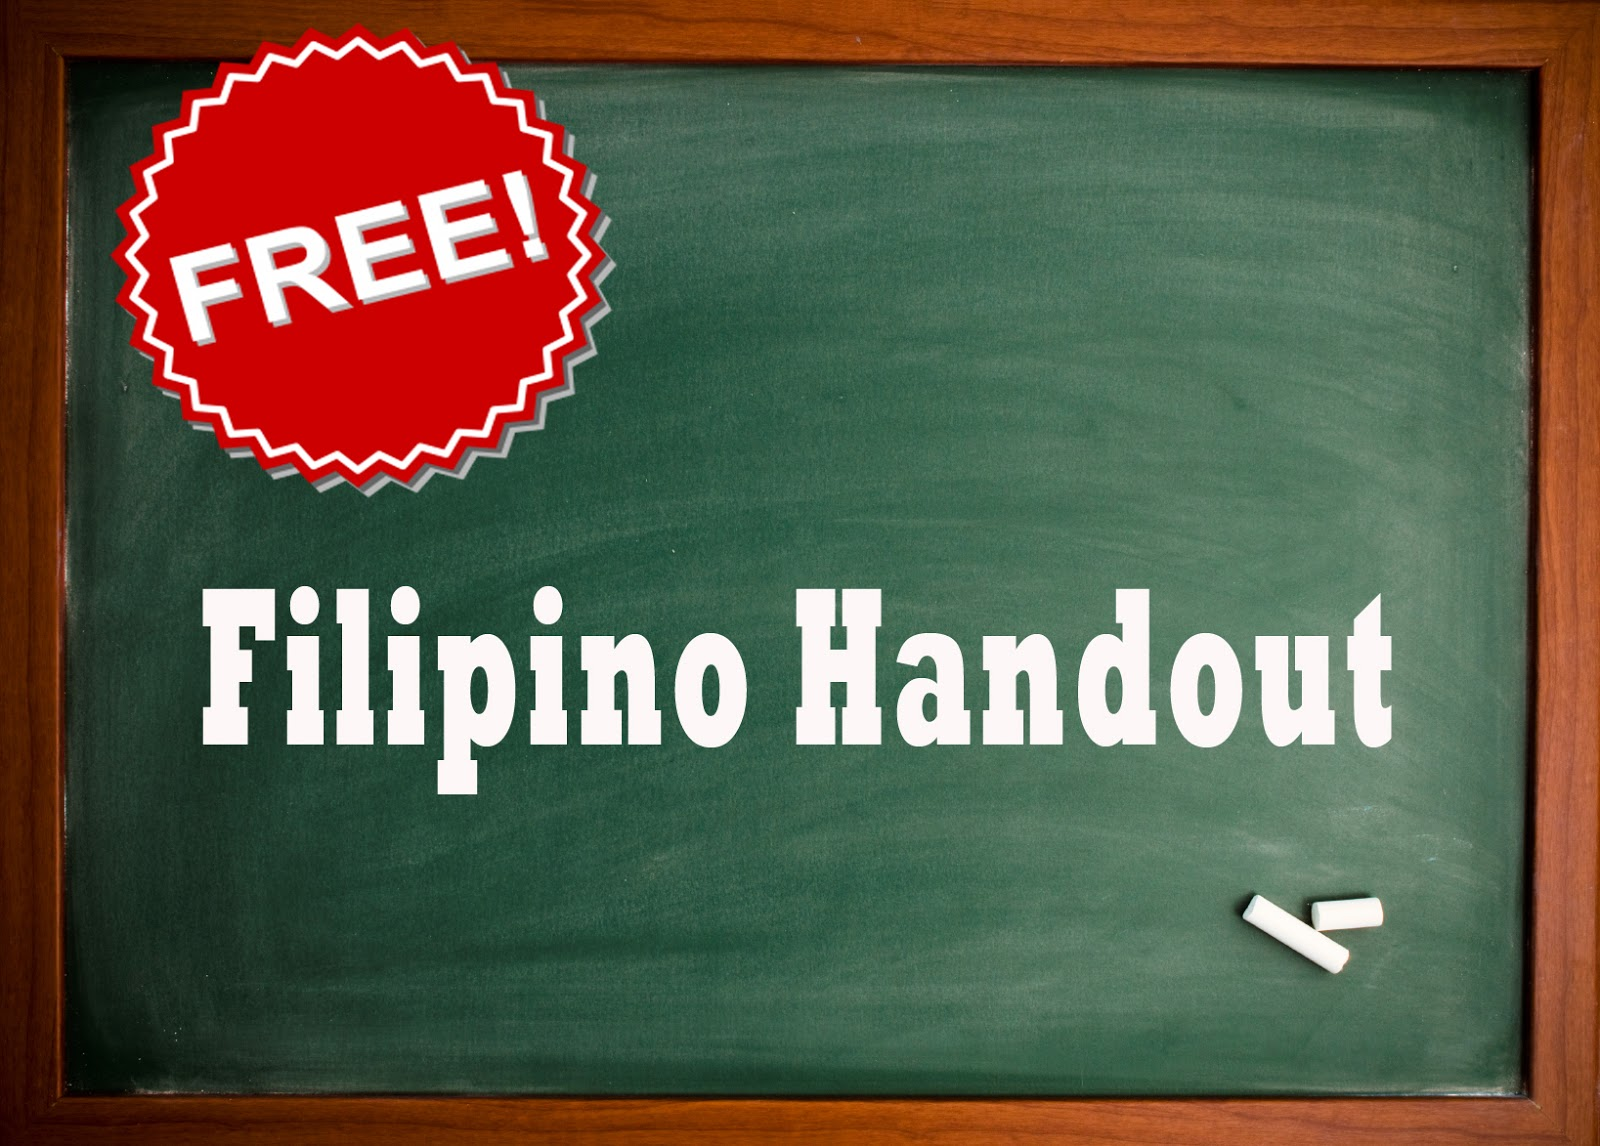 New Filipino Handout 2